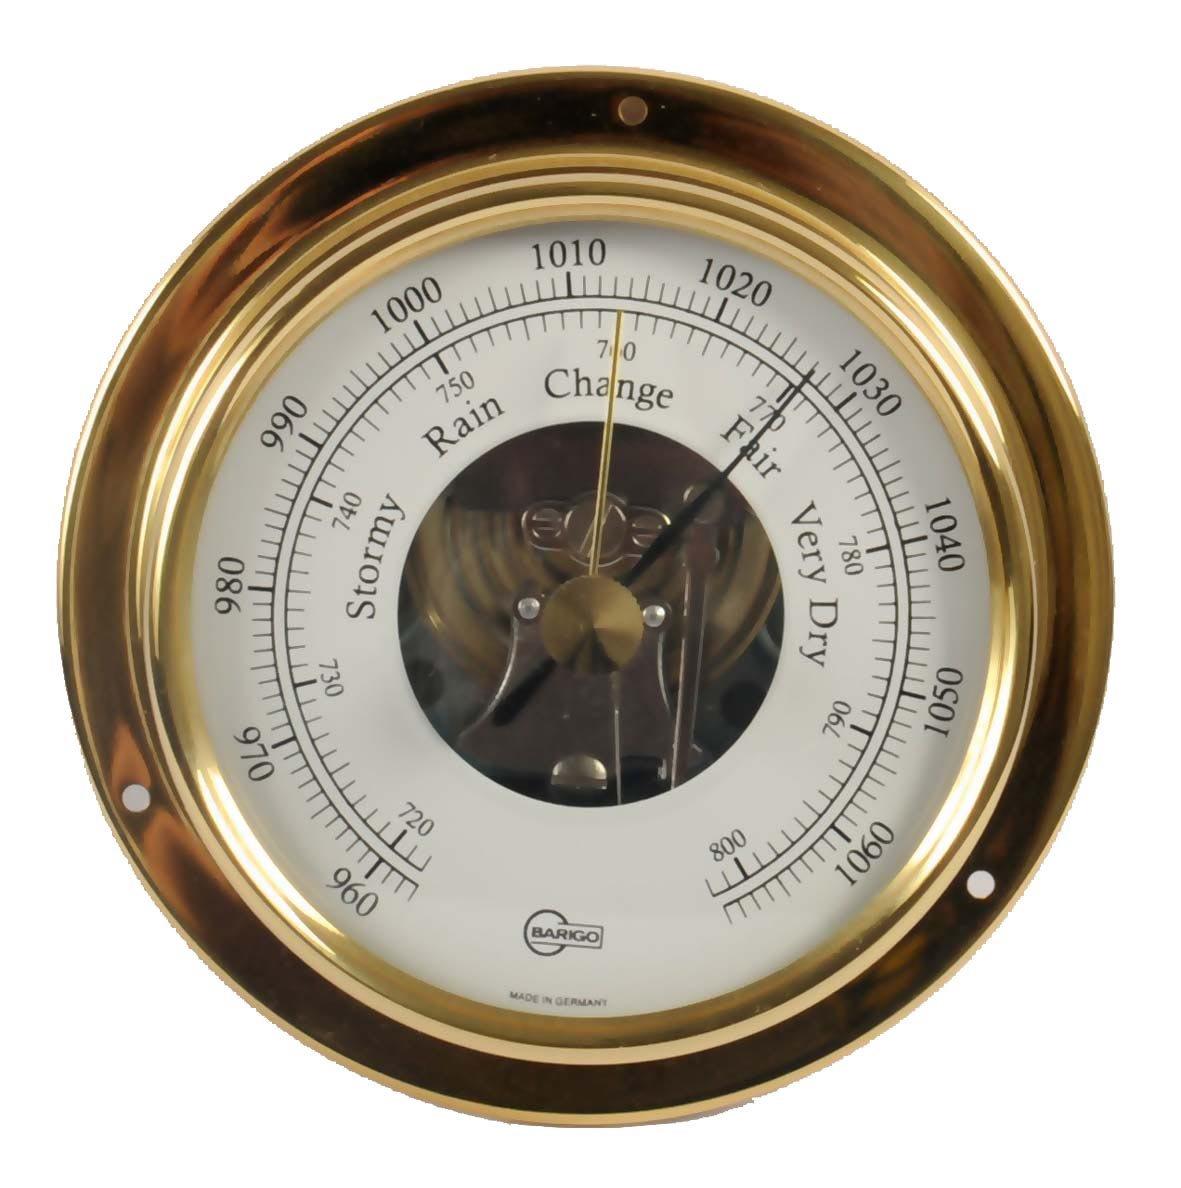 Barigo tempo S ottone barometro 1710